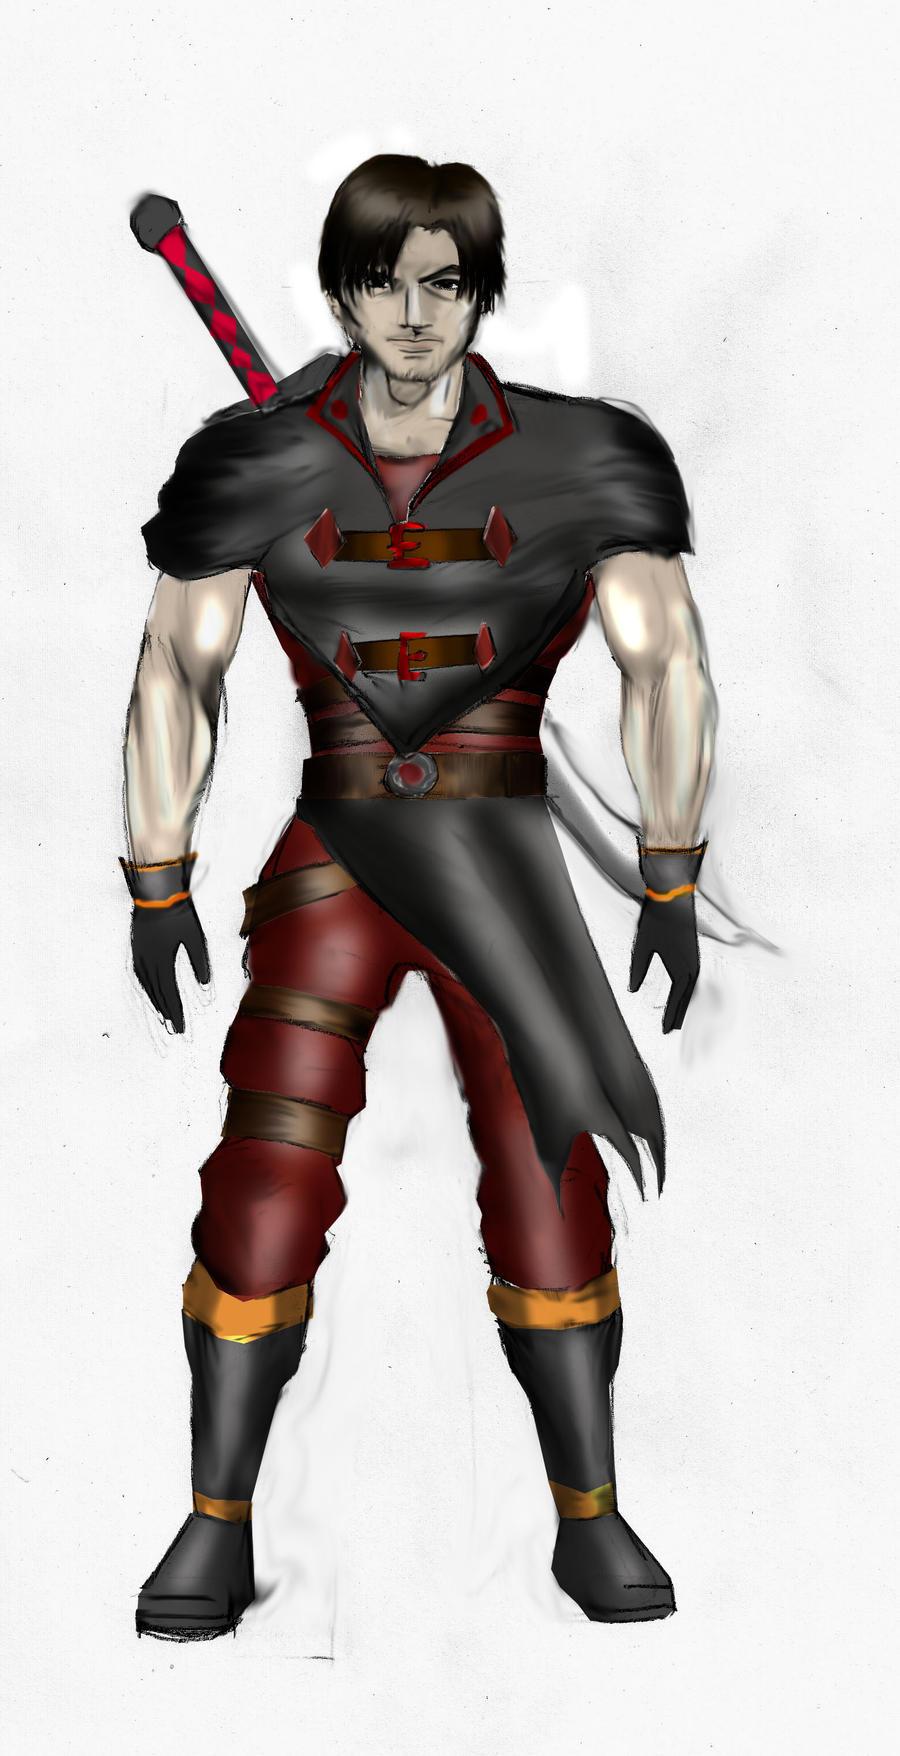 Final Version by gamerfan2000